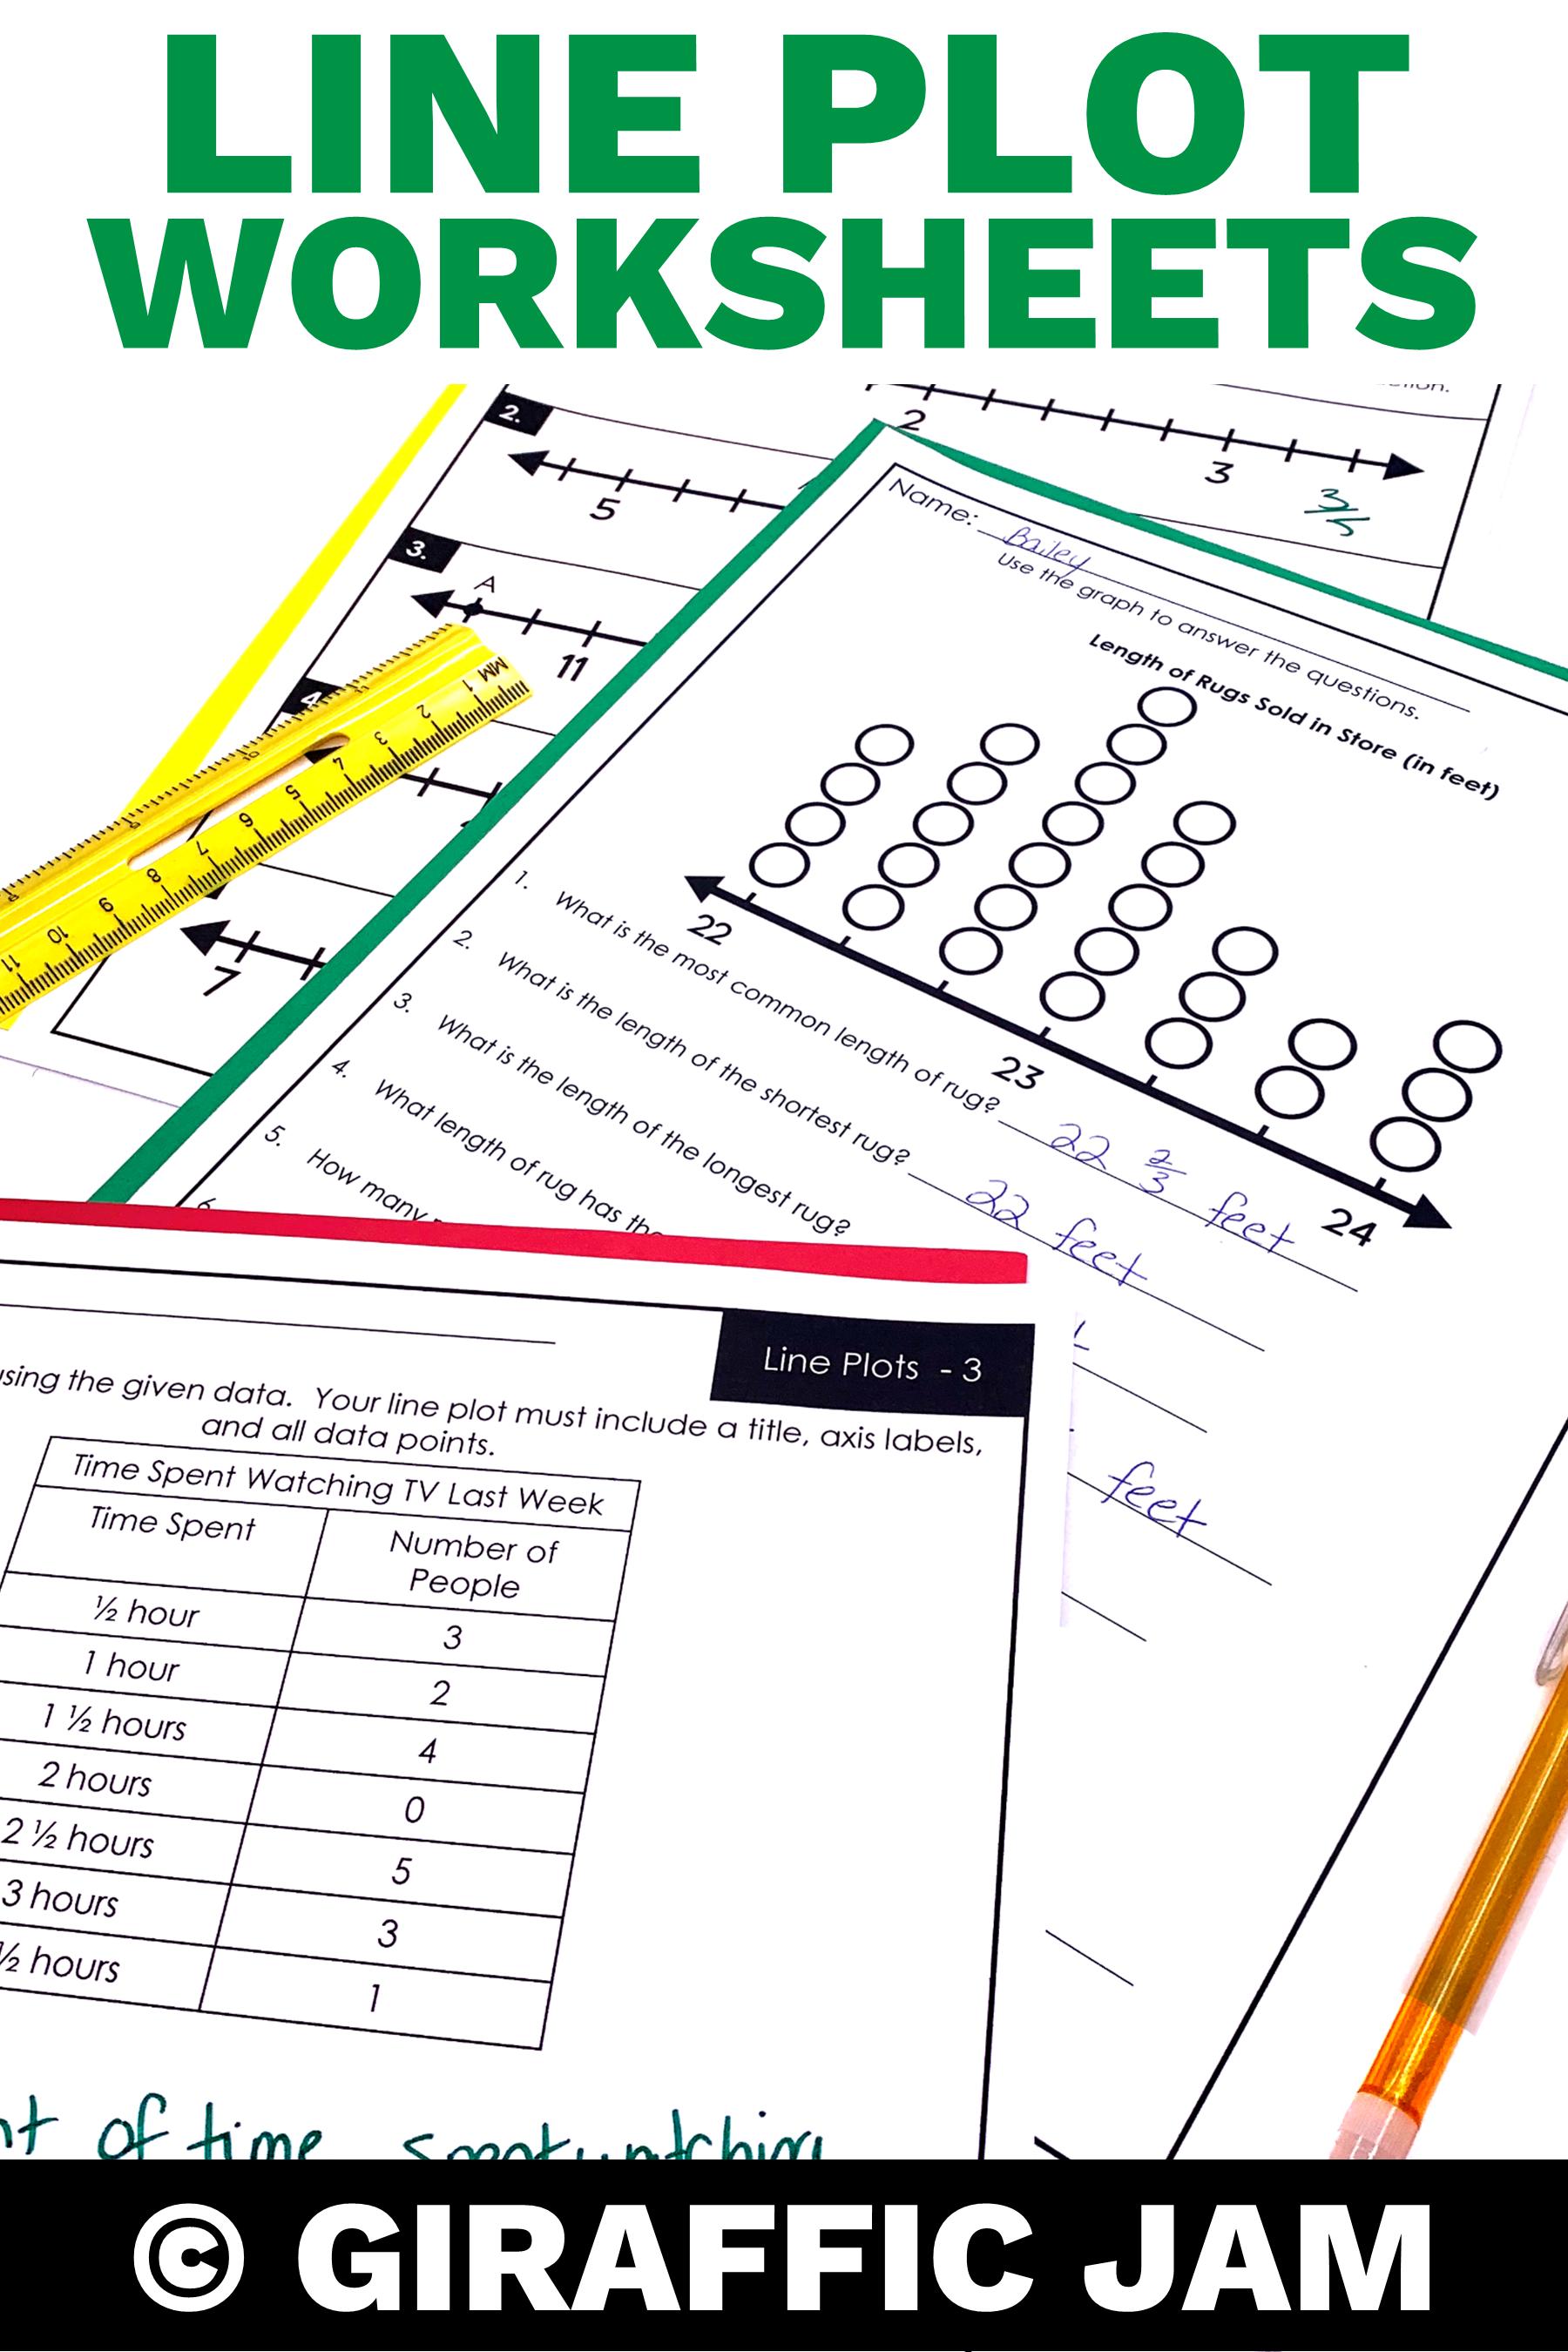 4th Grade Line Plots Interpreting Line Plots Measurement Worksheets 4th Grade Math Works Line Plot Worksheets Measurement Worksheets Measurement Homework [ 2700 x 1800 Pixel ]